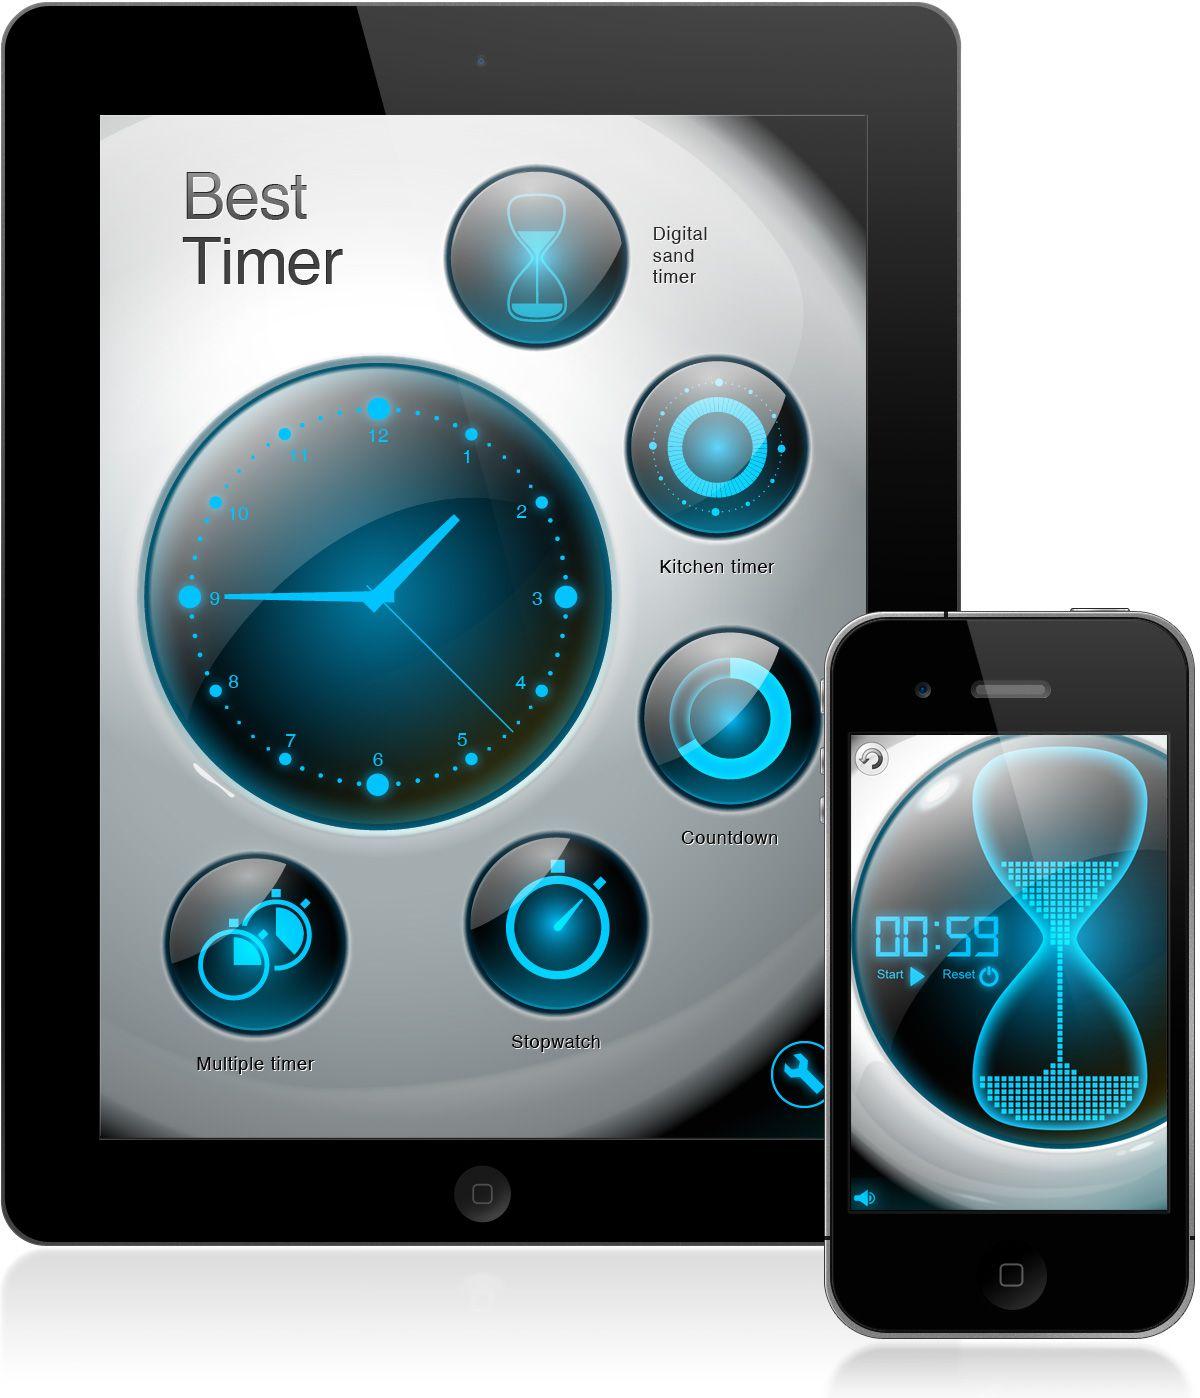 best ipad user guide app